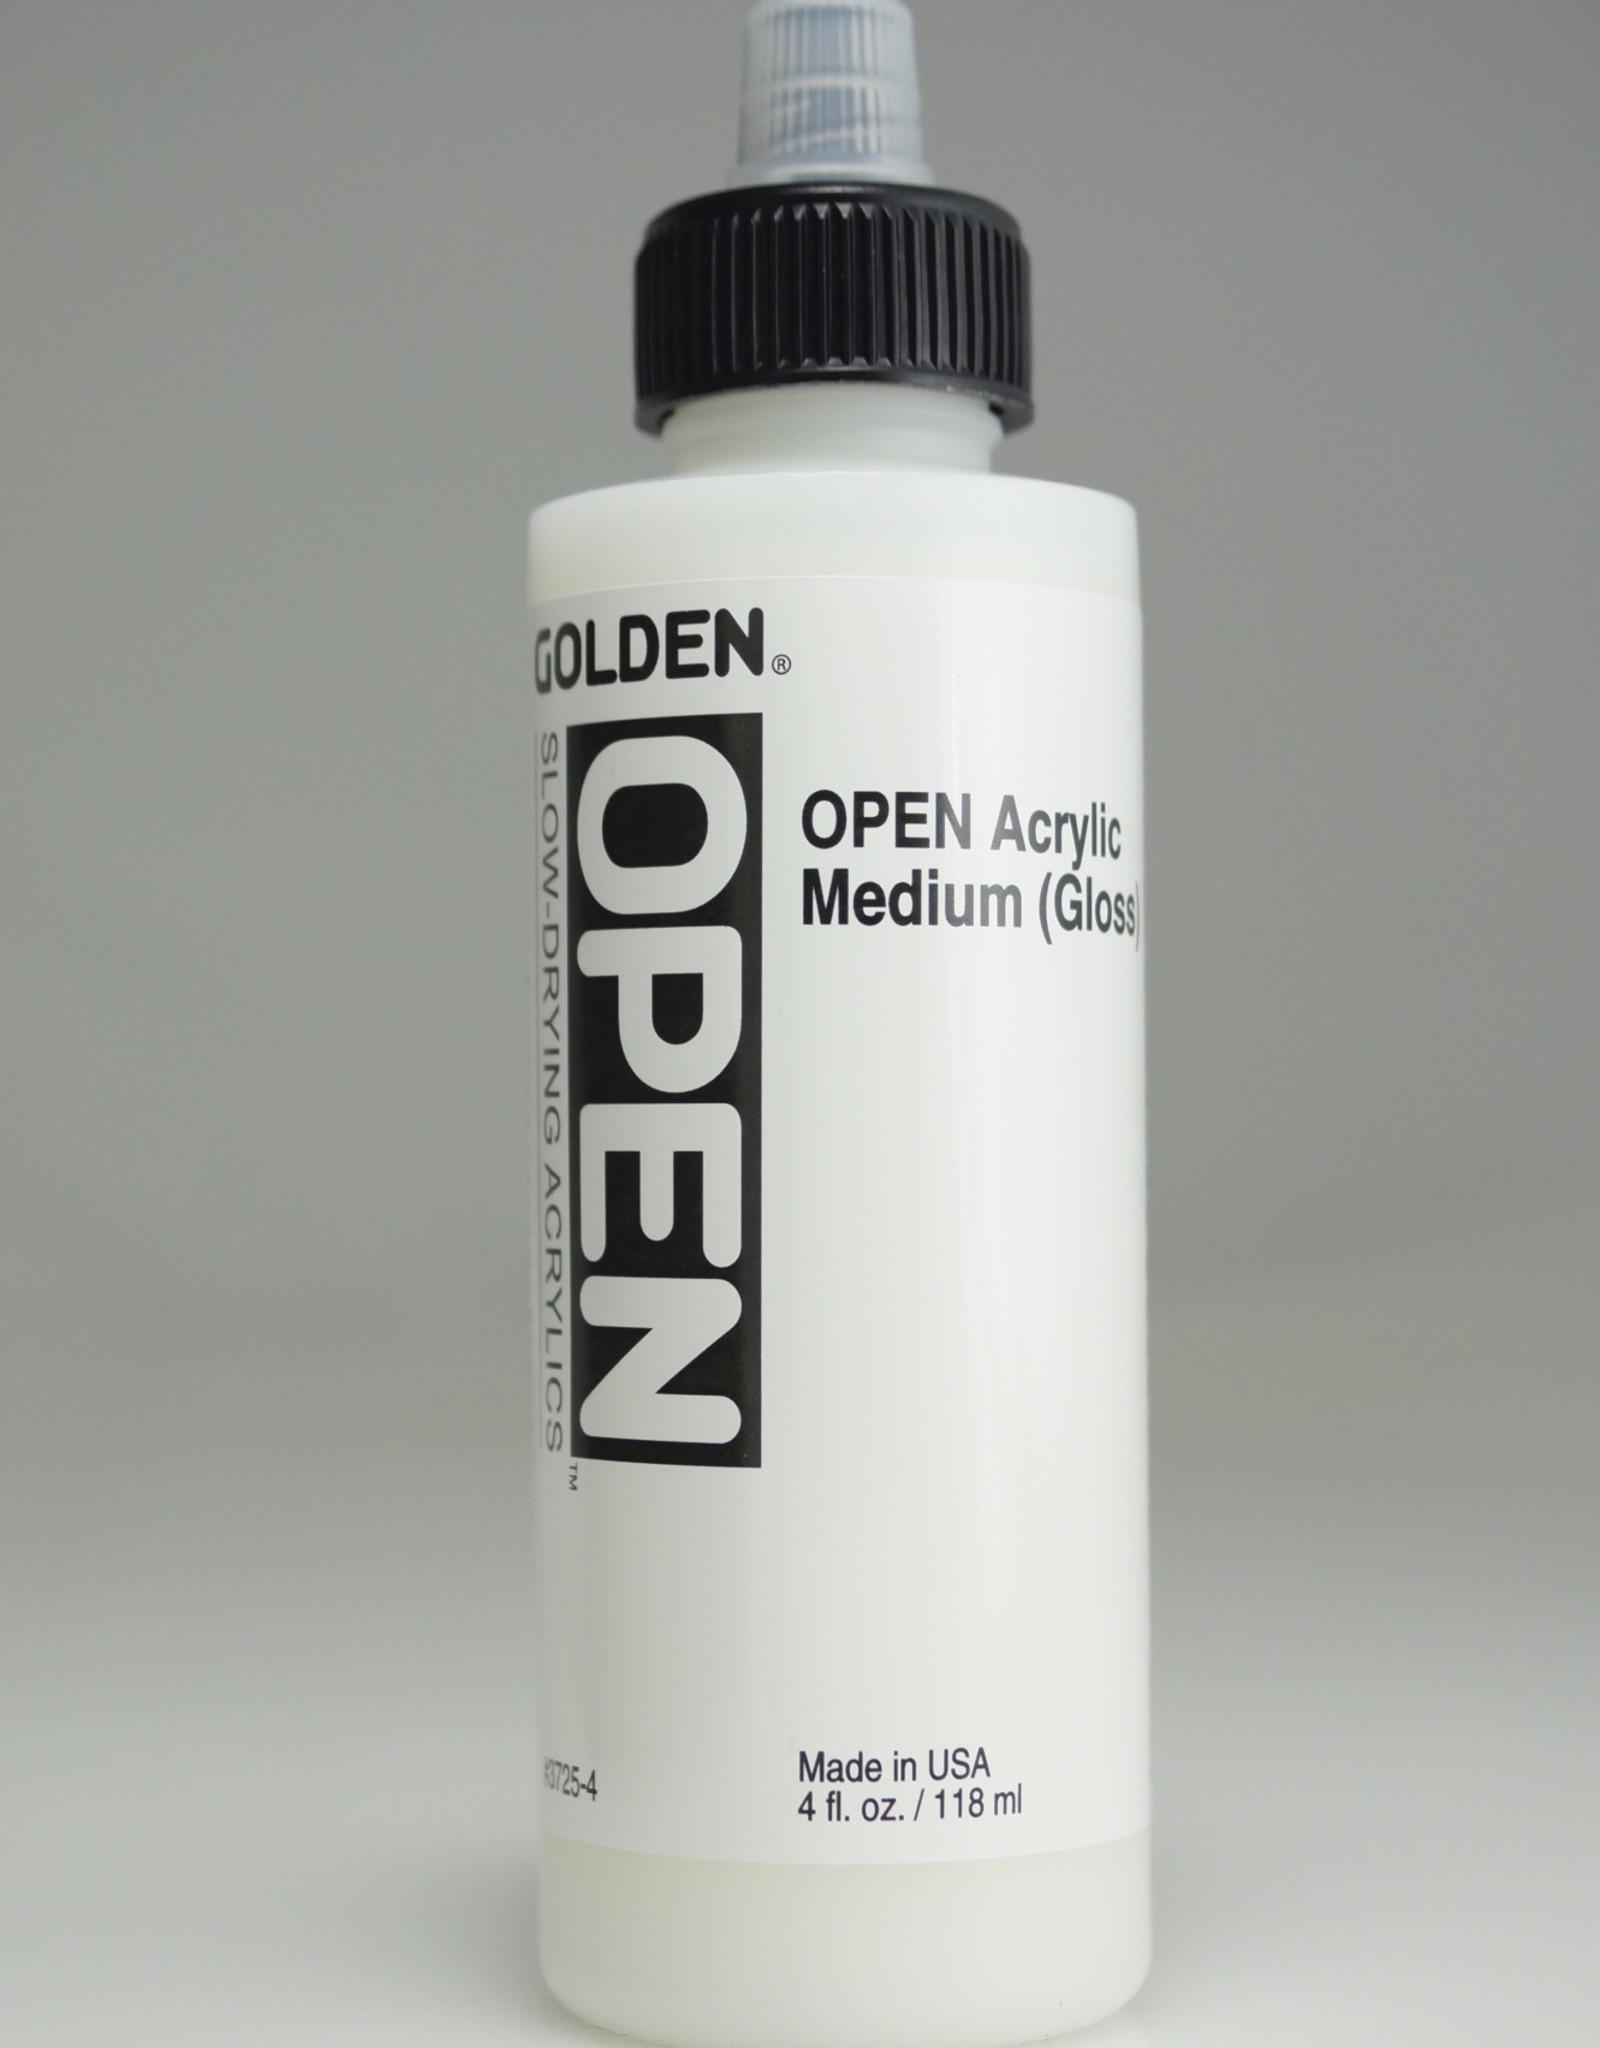 Golden OPEN Acrylic Medium, Gloss, 4 Fl Oz.